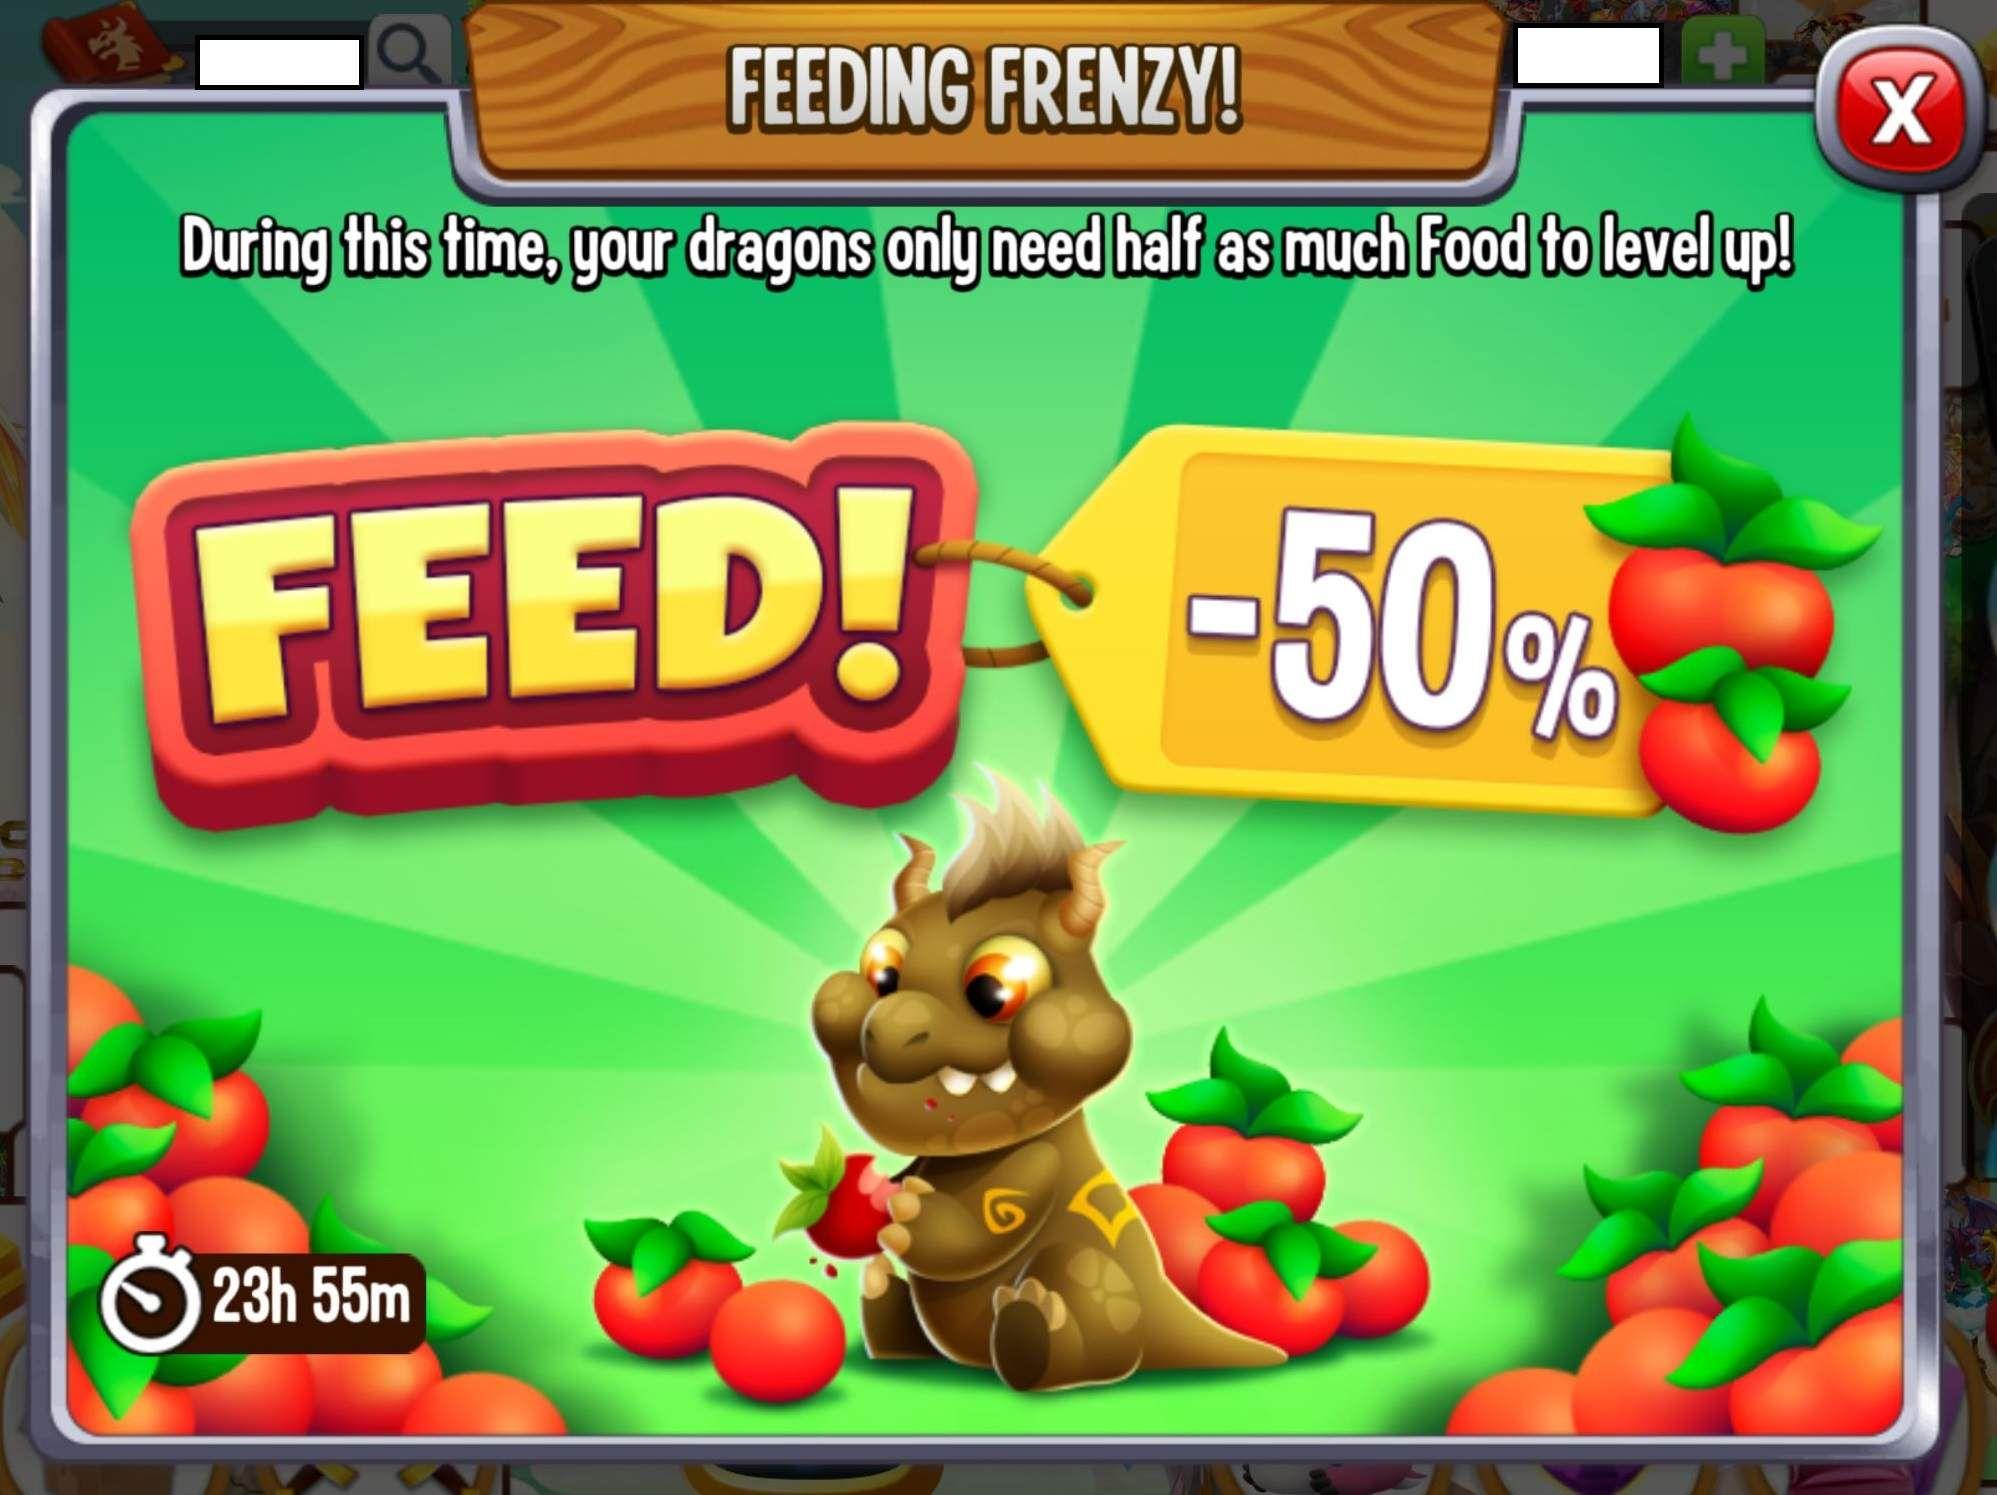 0_1587984016121_042720 half off feeding.jpg